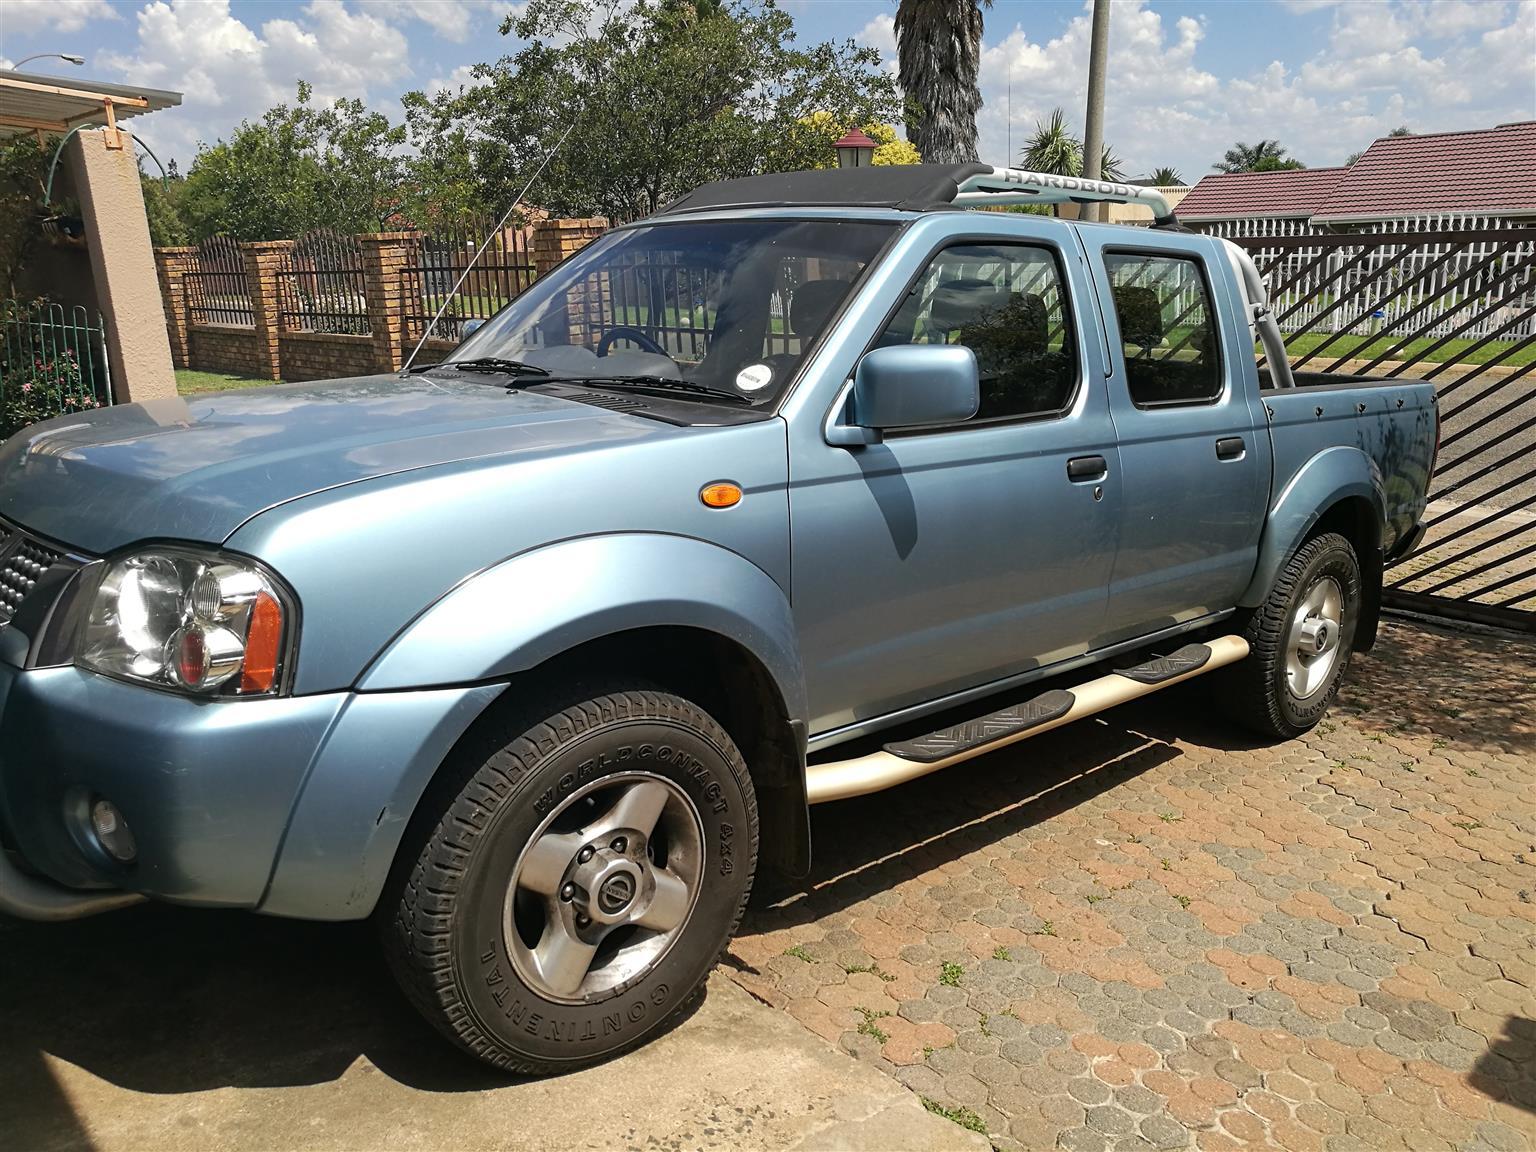 2005 Nissan Hardbody Junk Mail